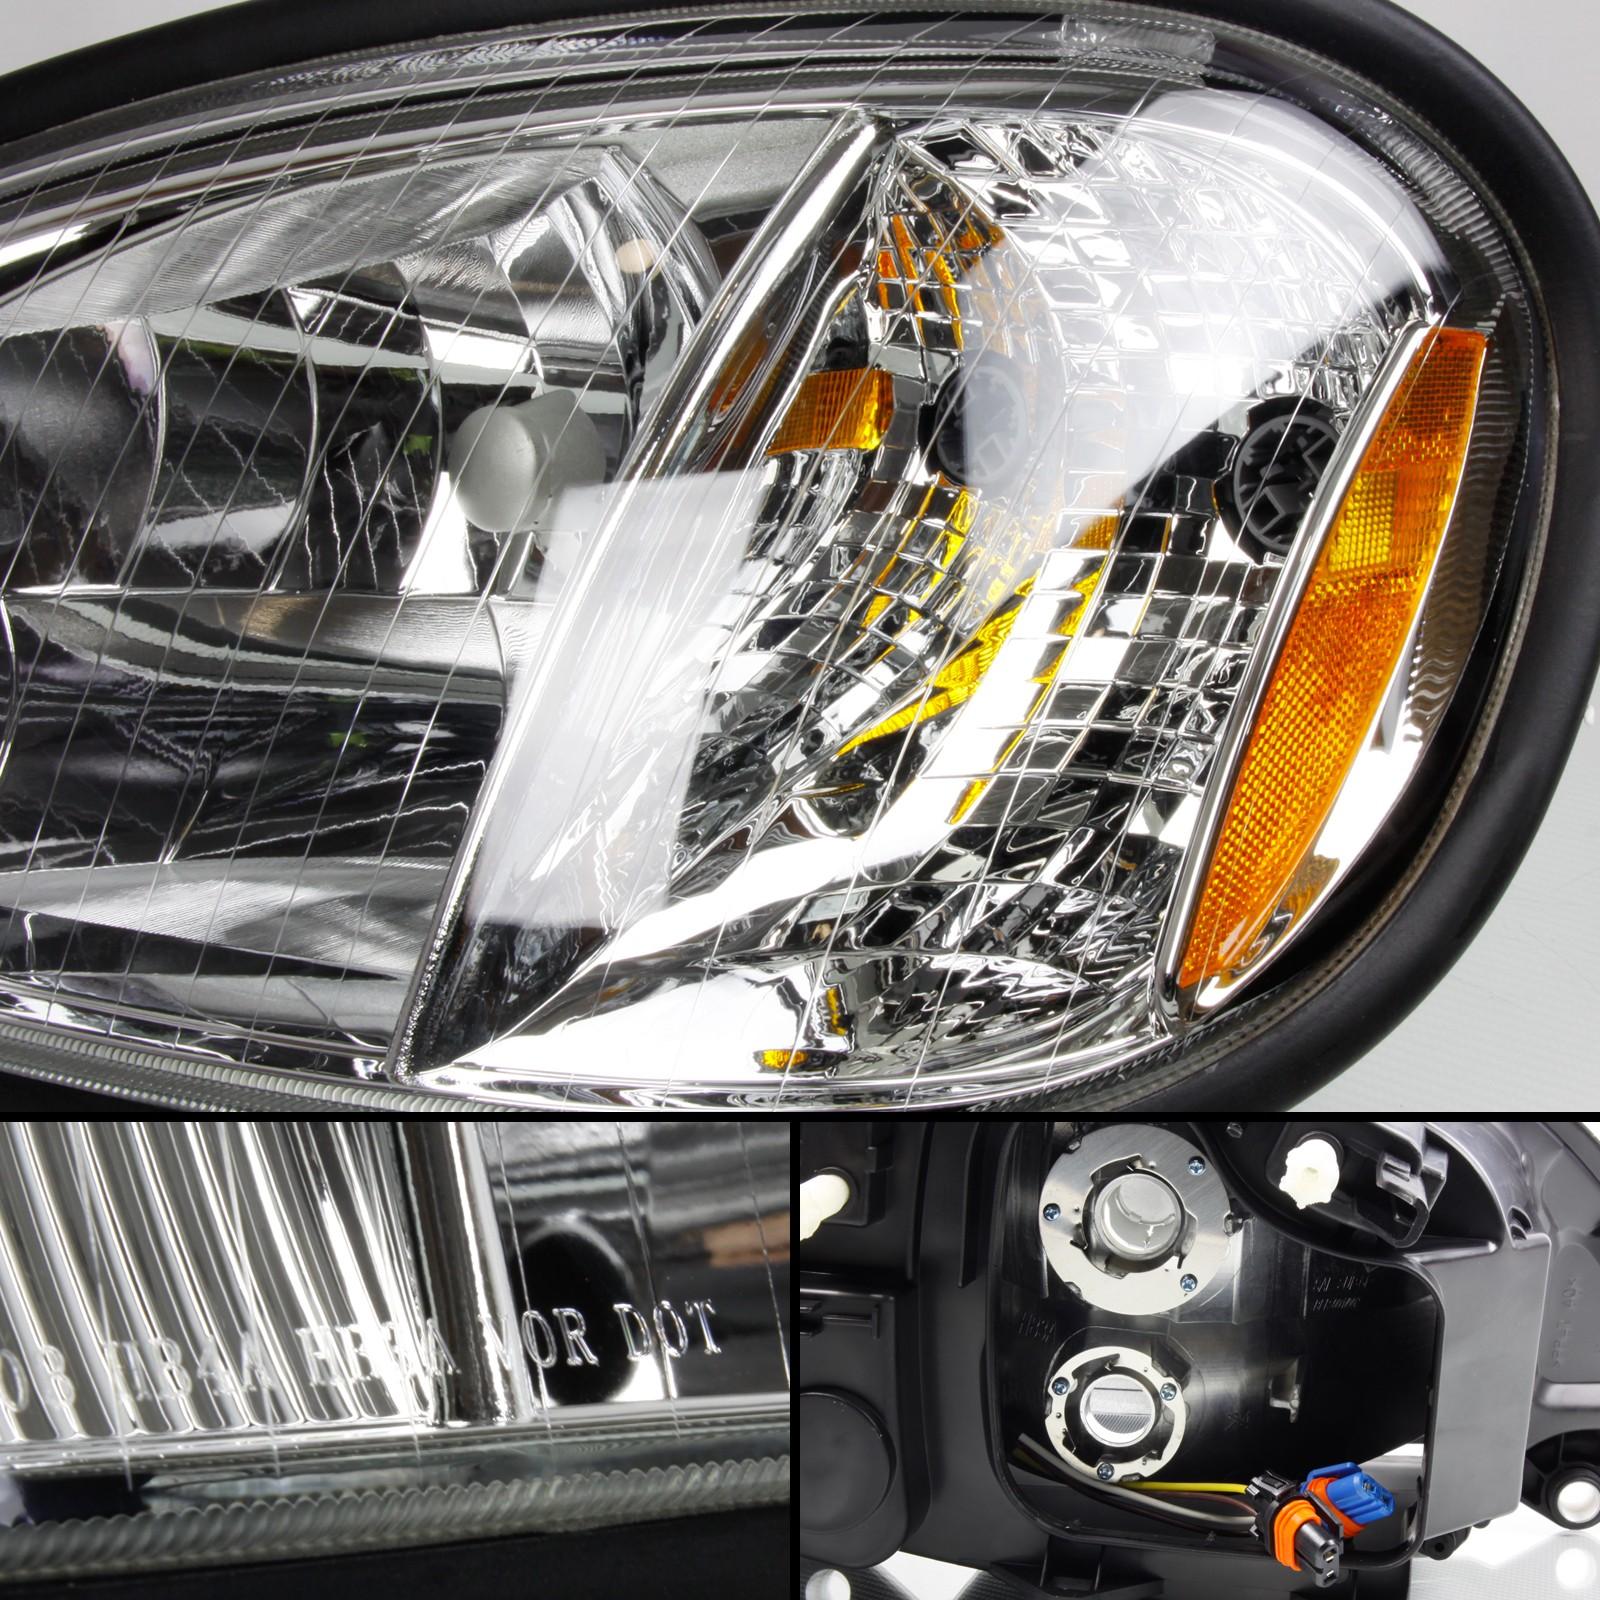 Optix 2004-2016 Freightliner Columbia Truck Headlight + 9006 Low Beam and  9005 High Beam LED Headlight Conversion Kit Combo (2 Pairs)